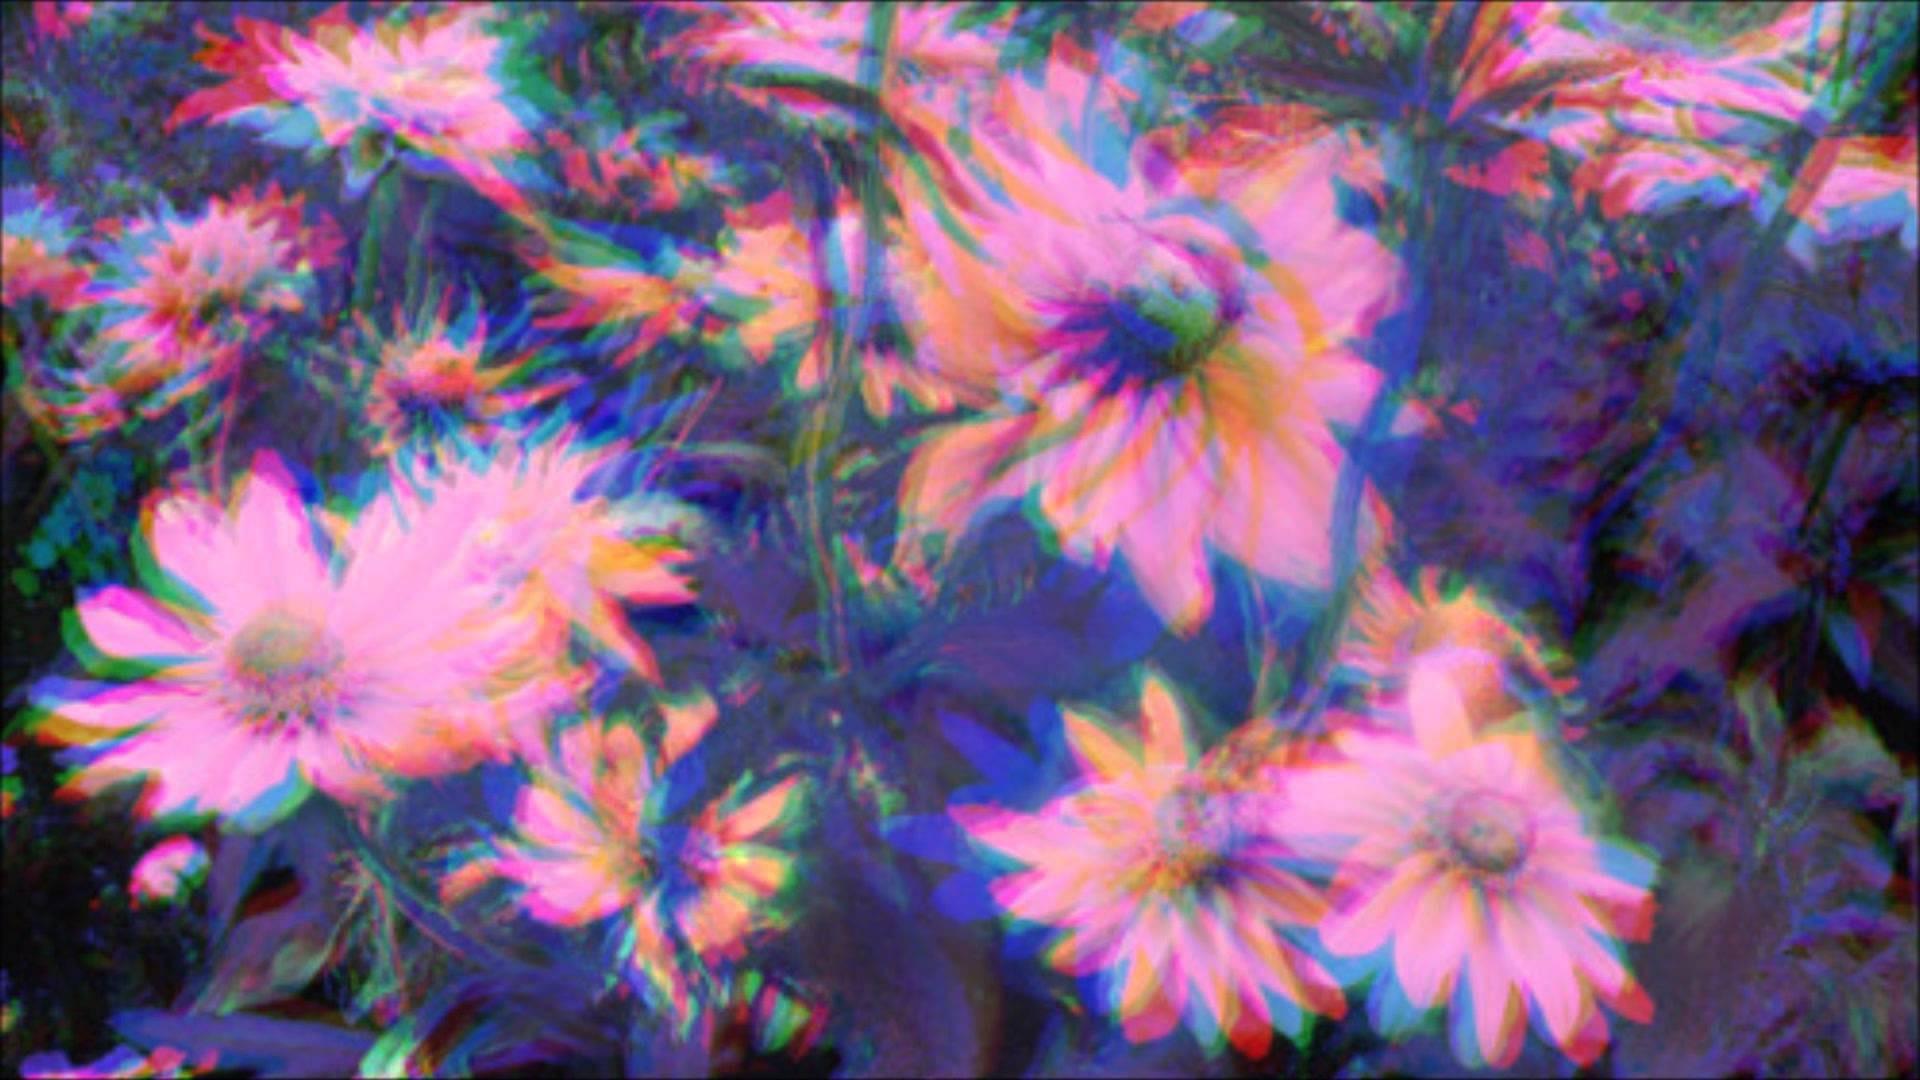 Iphone wallpaper tumblr hippie